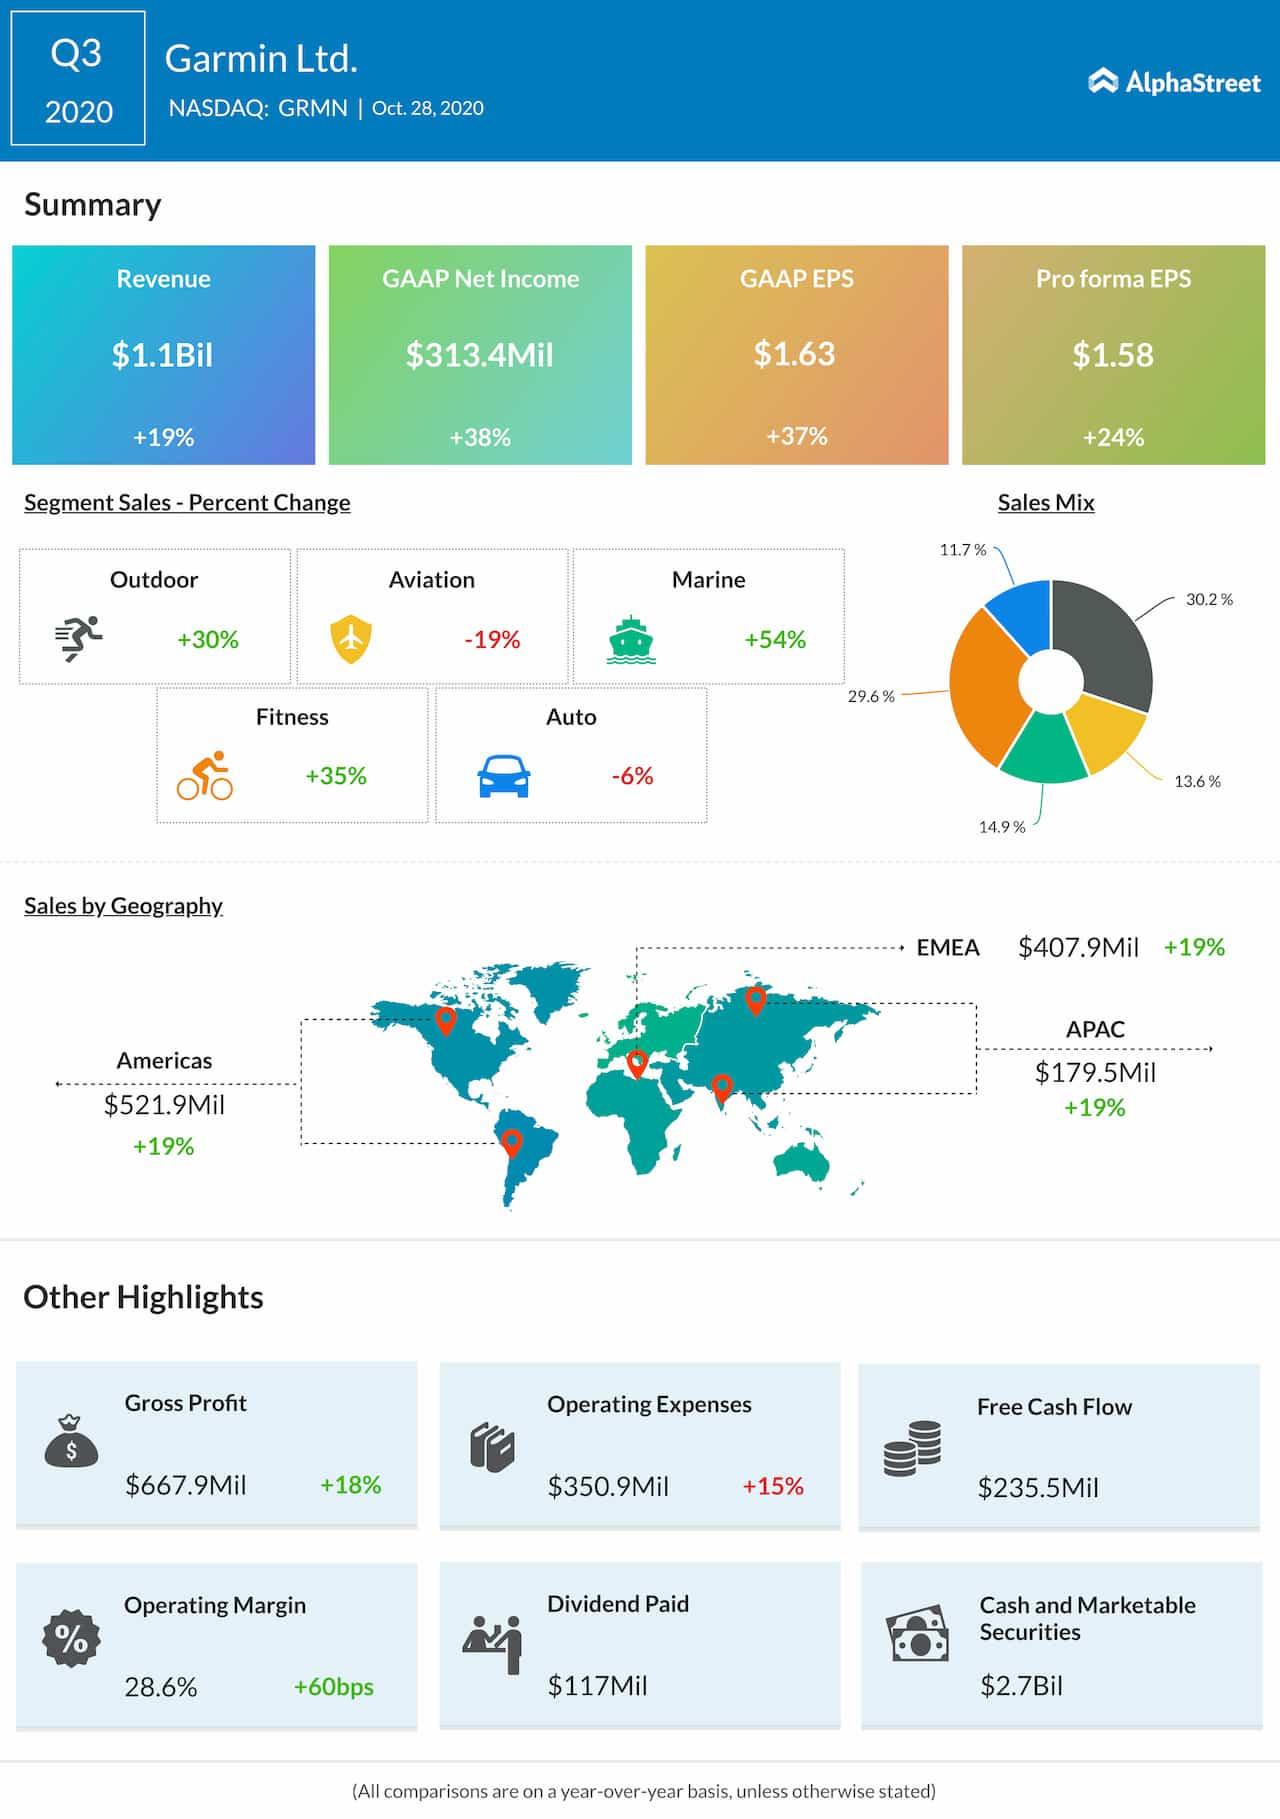 Garmin Q3 2020 Earnings Infographic